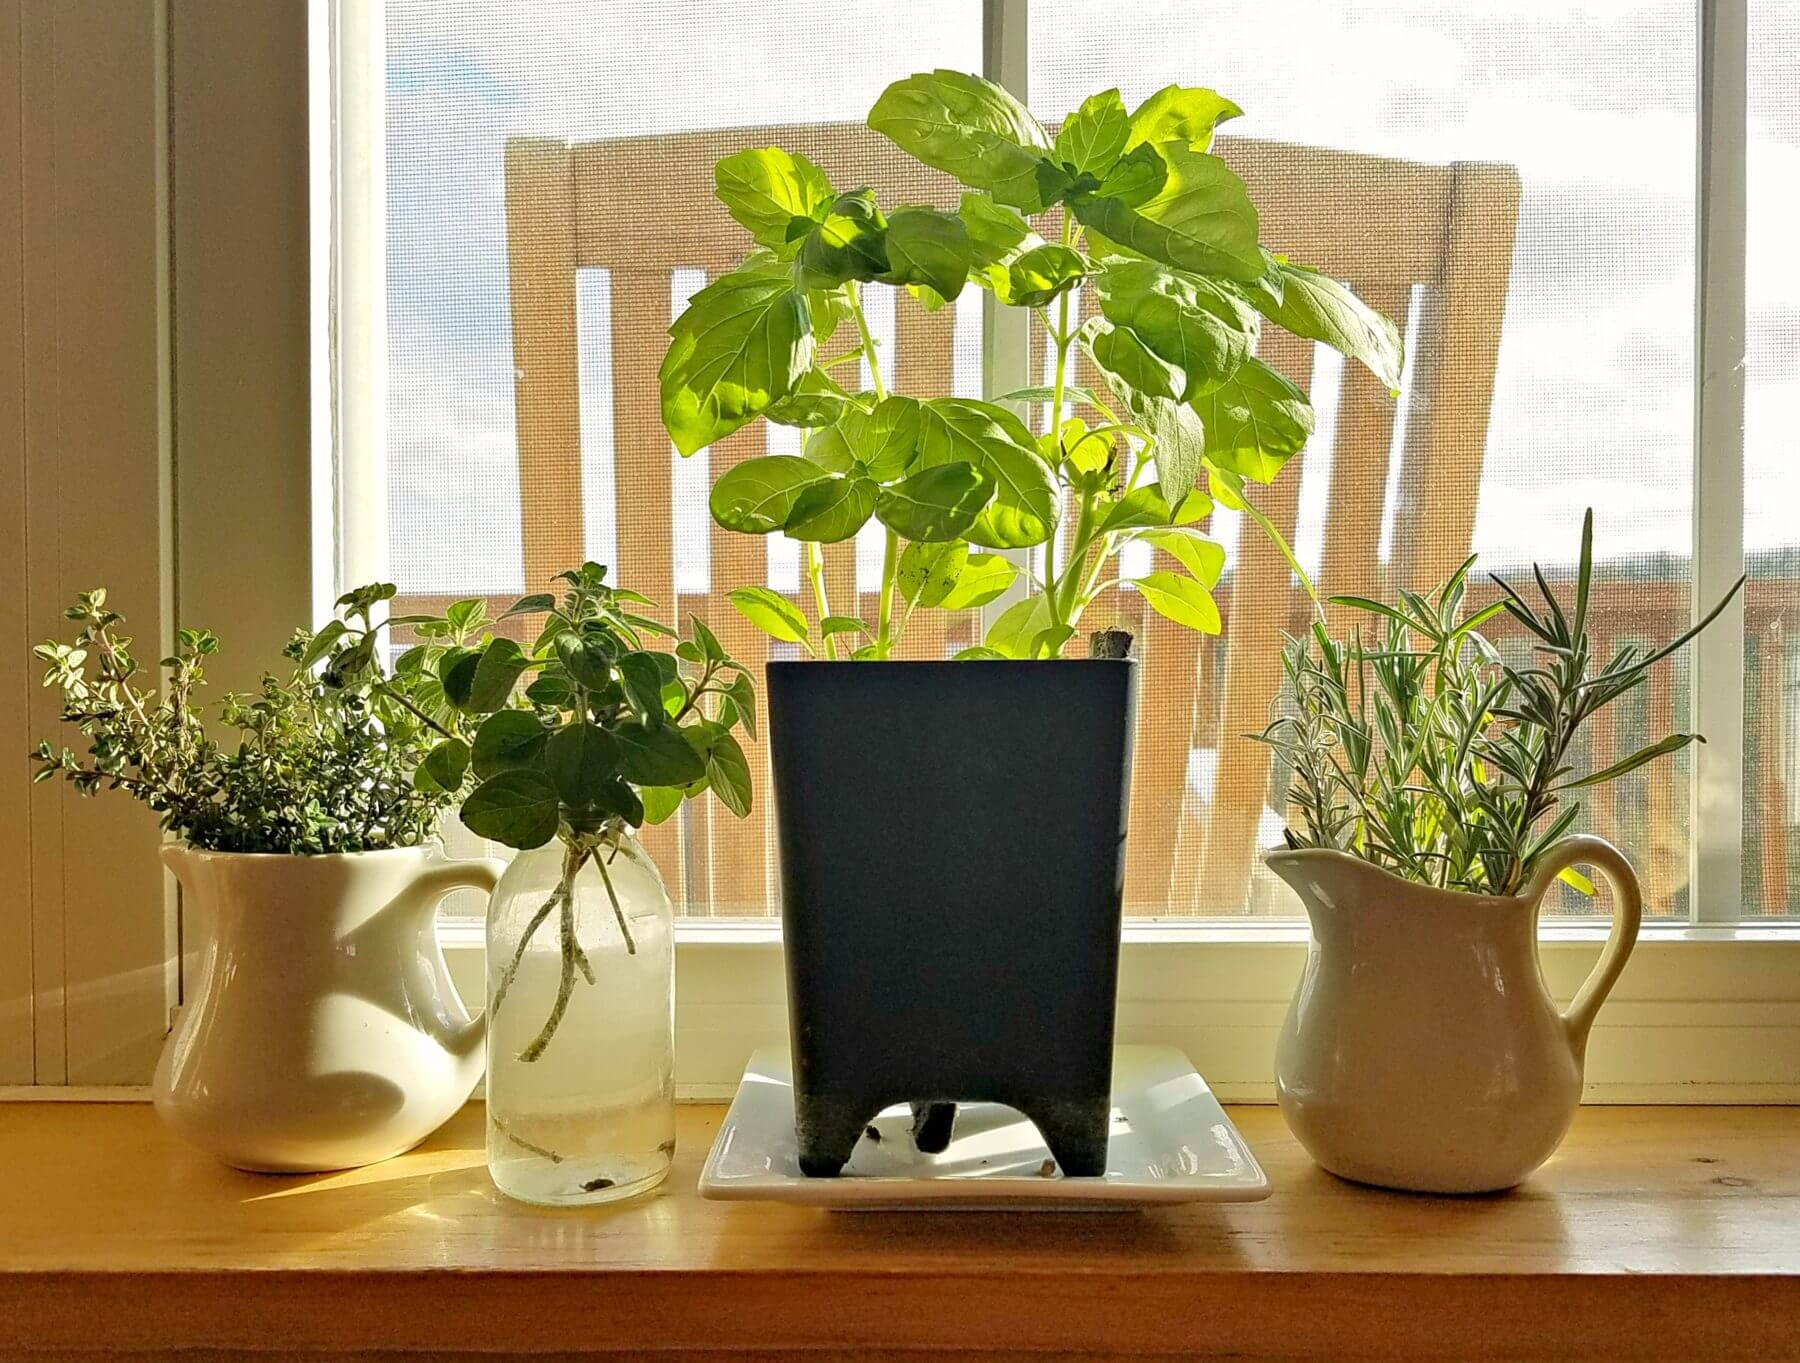 Herbs growing on windowsill